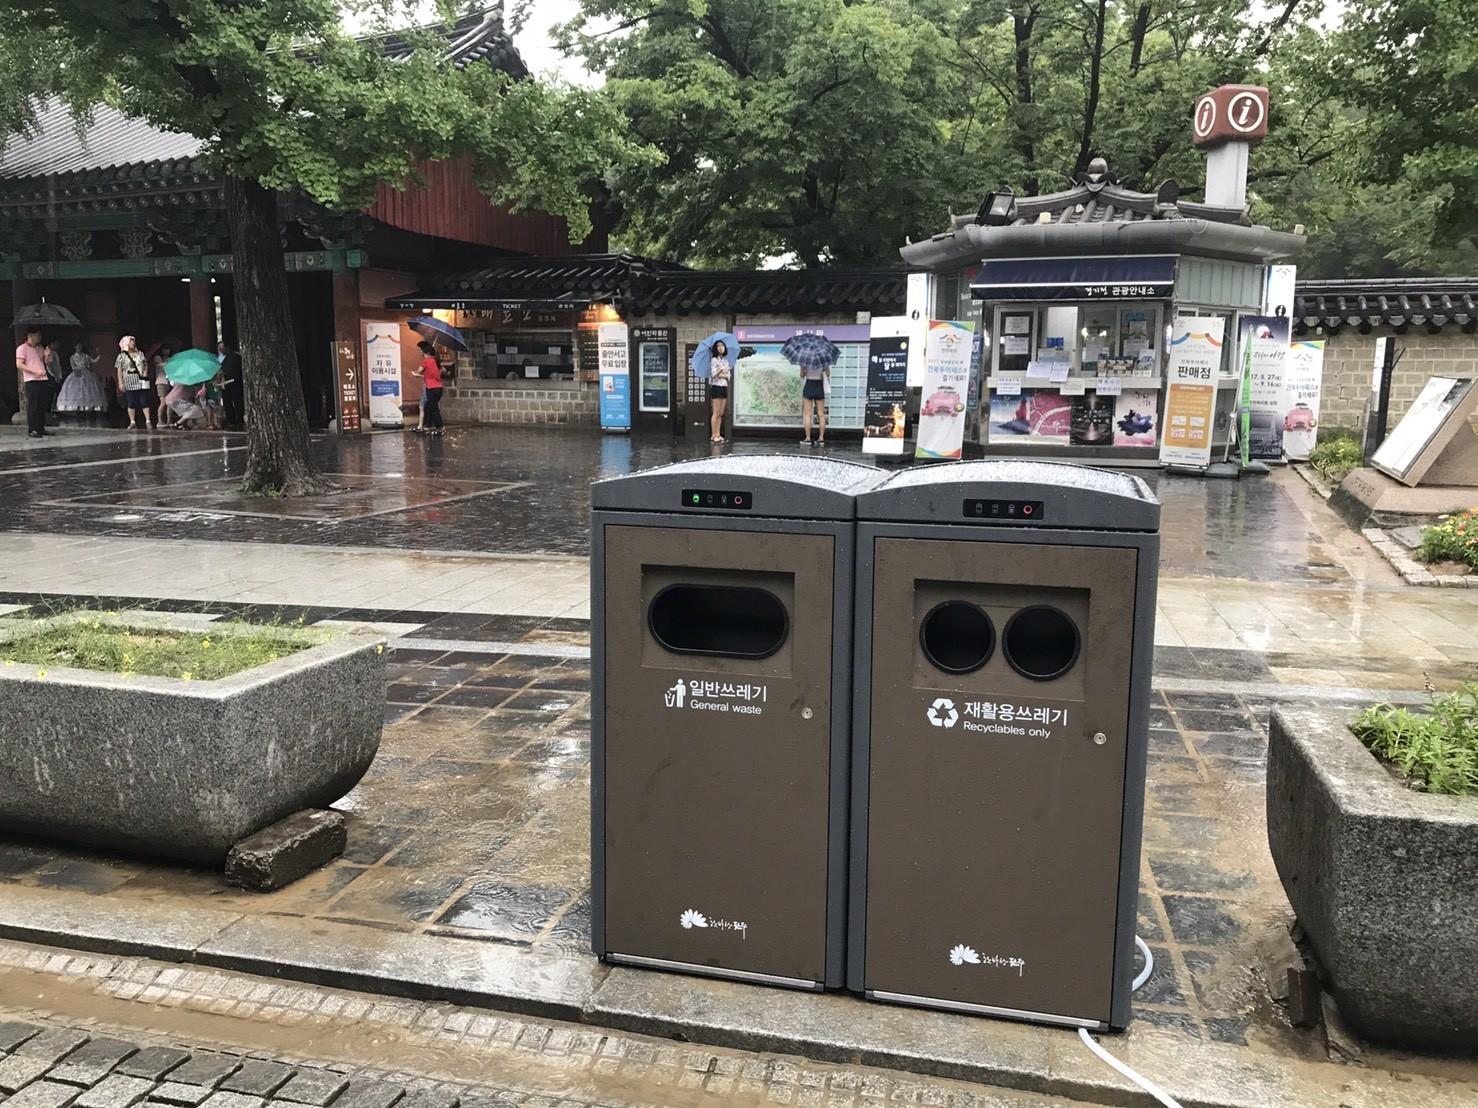 South Korean solar trash bin